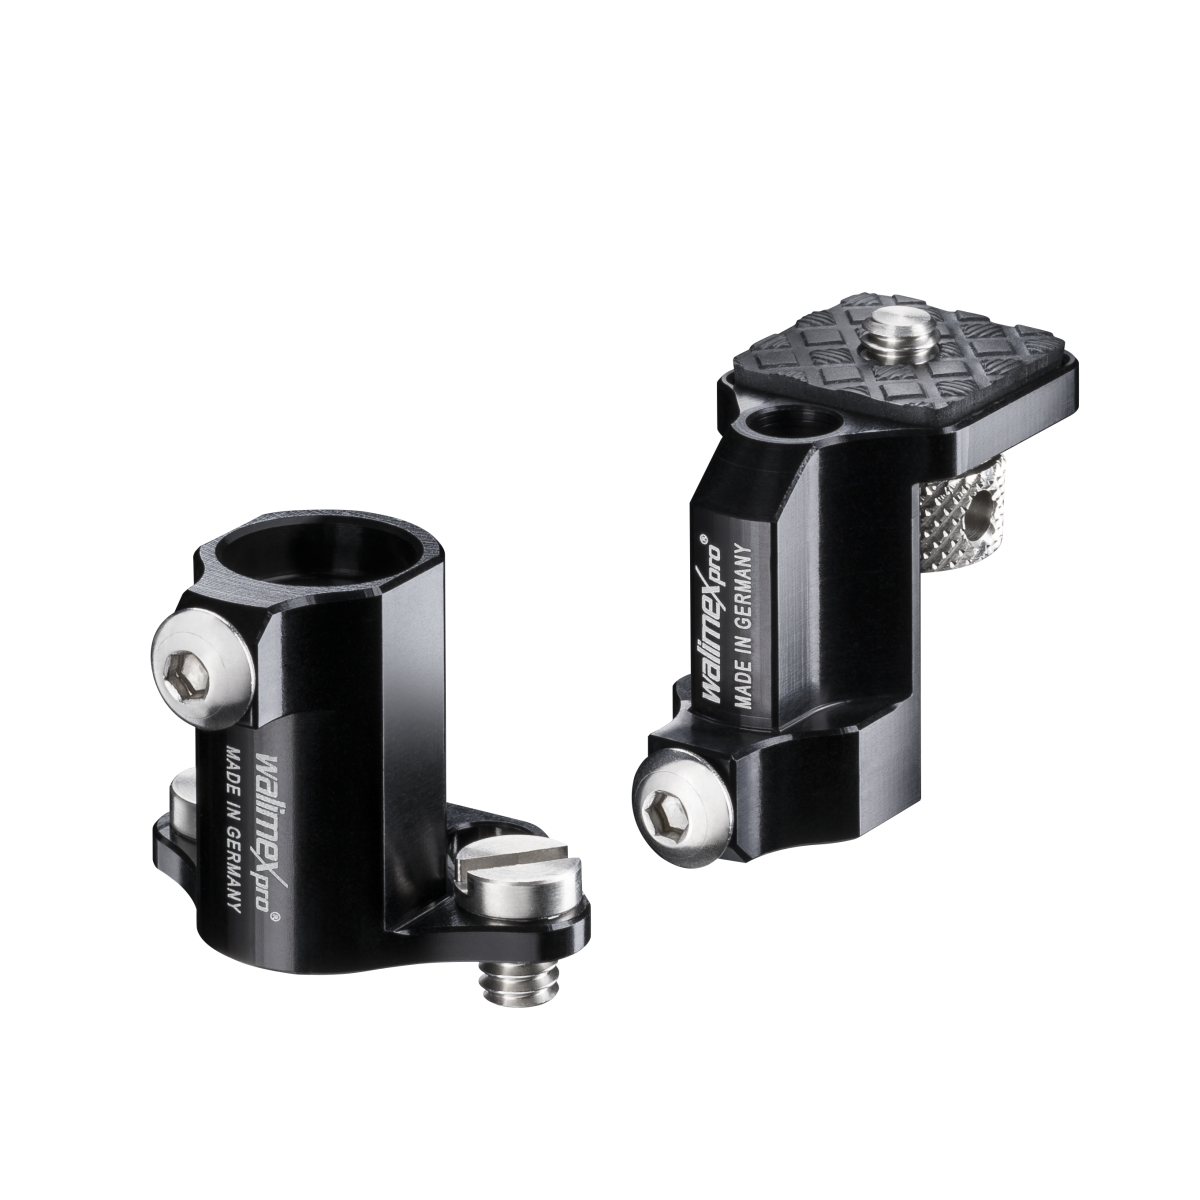 Walimex pro Swivel Arm anti-twist safeguard device